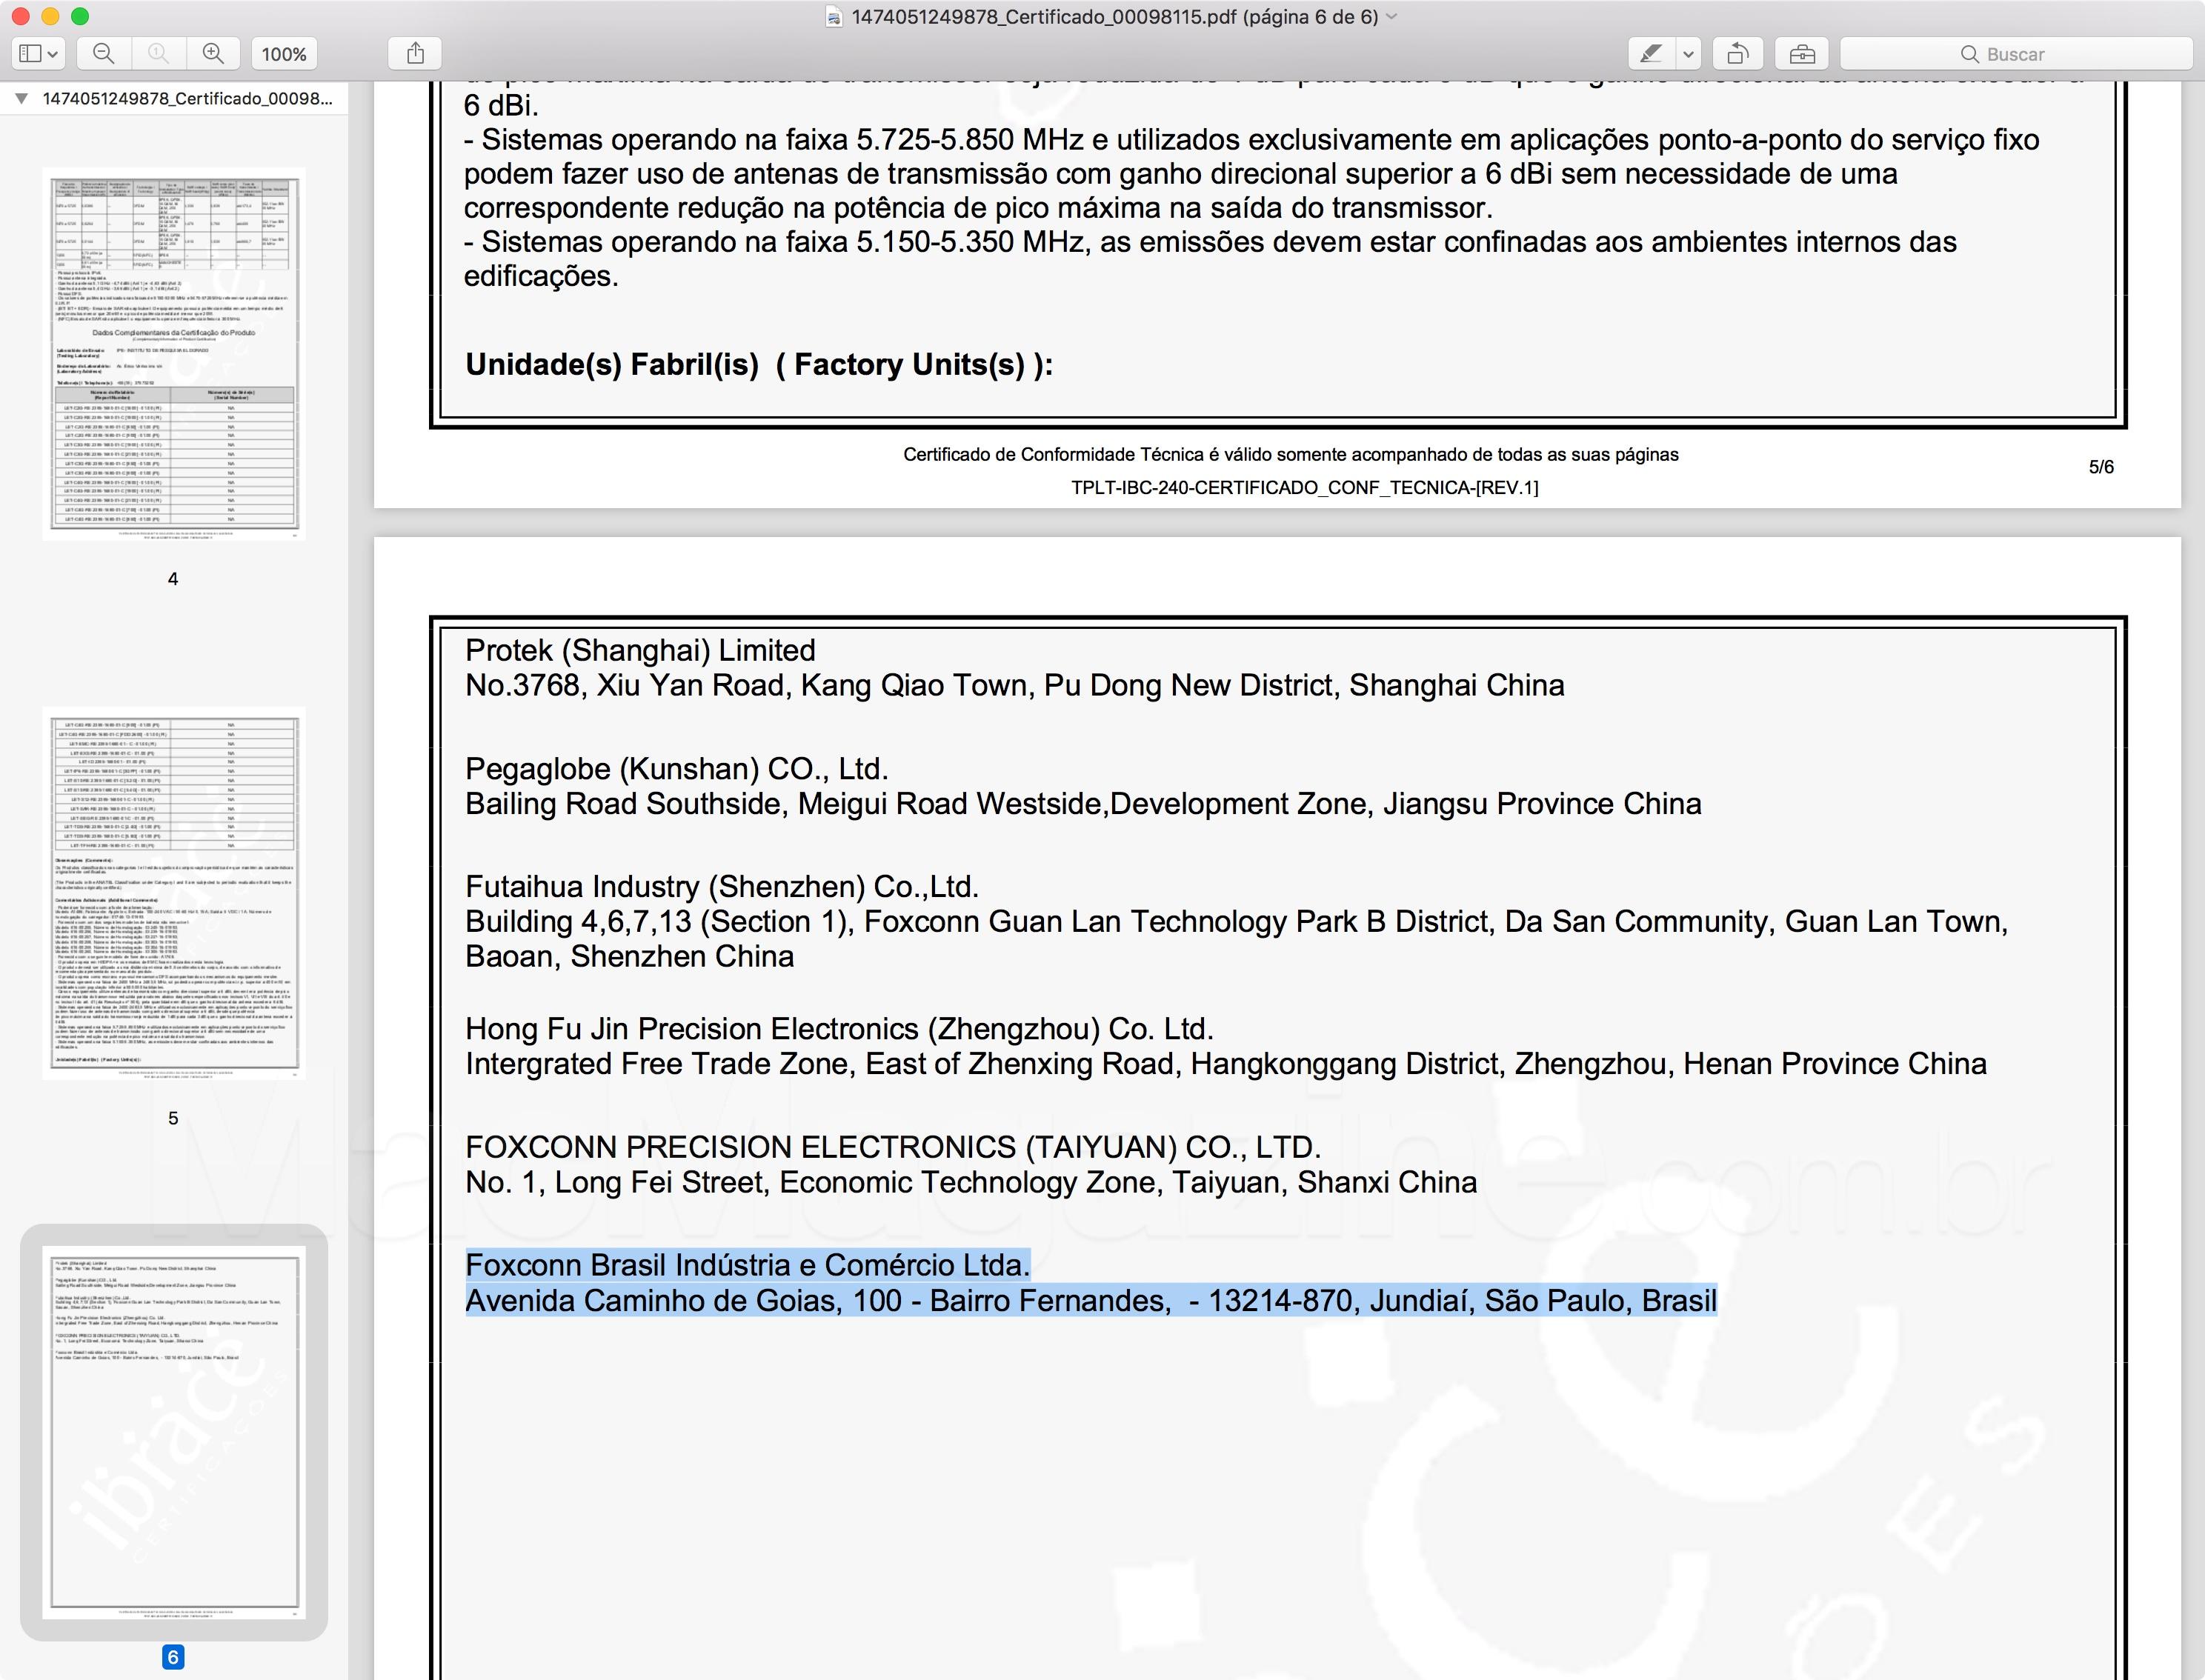 Foxconn Brasil no Certificado de Conformidade Técnica do iPhone 7 (A1778)